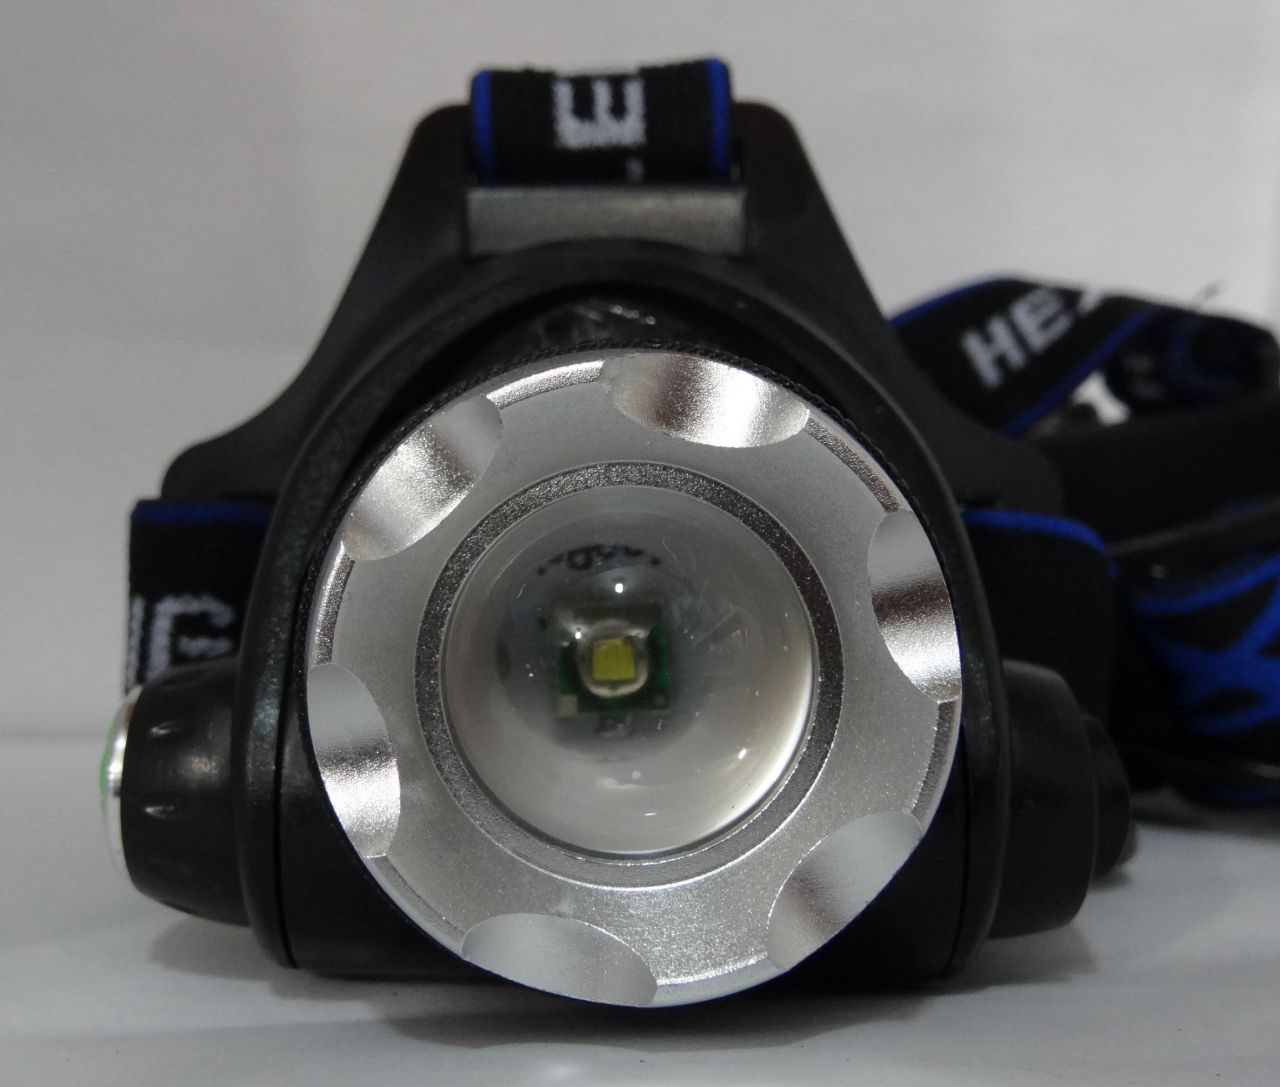 200w Fejlámpa 2db Akkumulátorral Cree Led zoom - High Power - kék